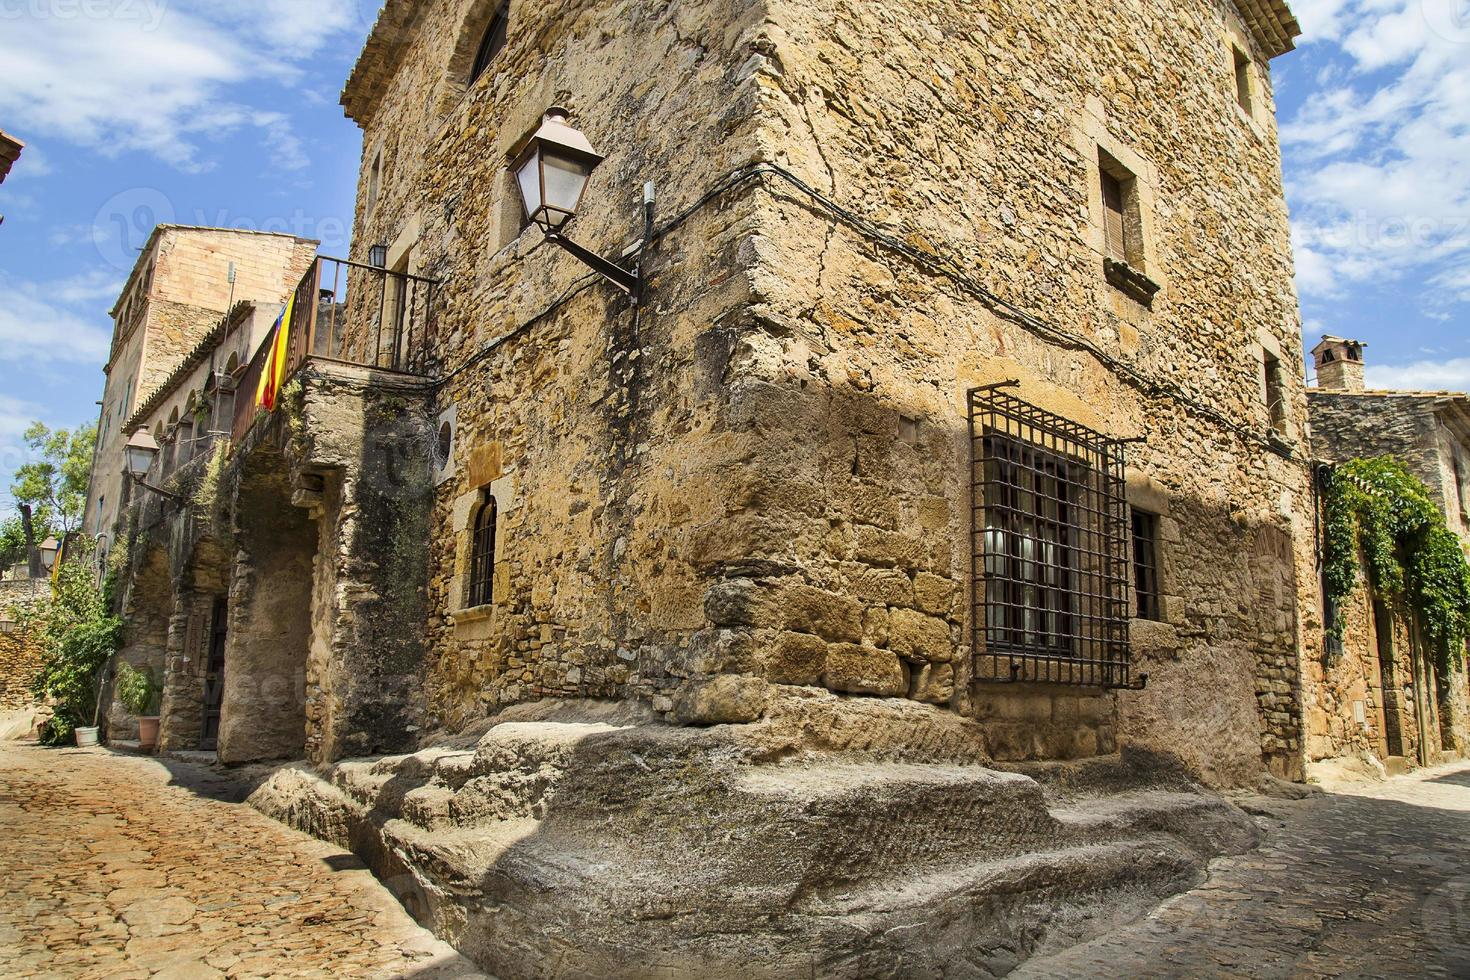 cidade medieval de paralelepípedos na Catalunha foto